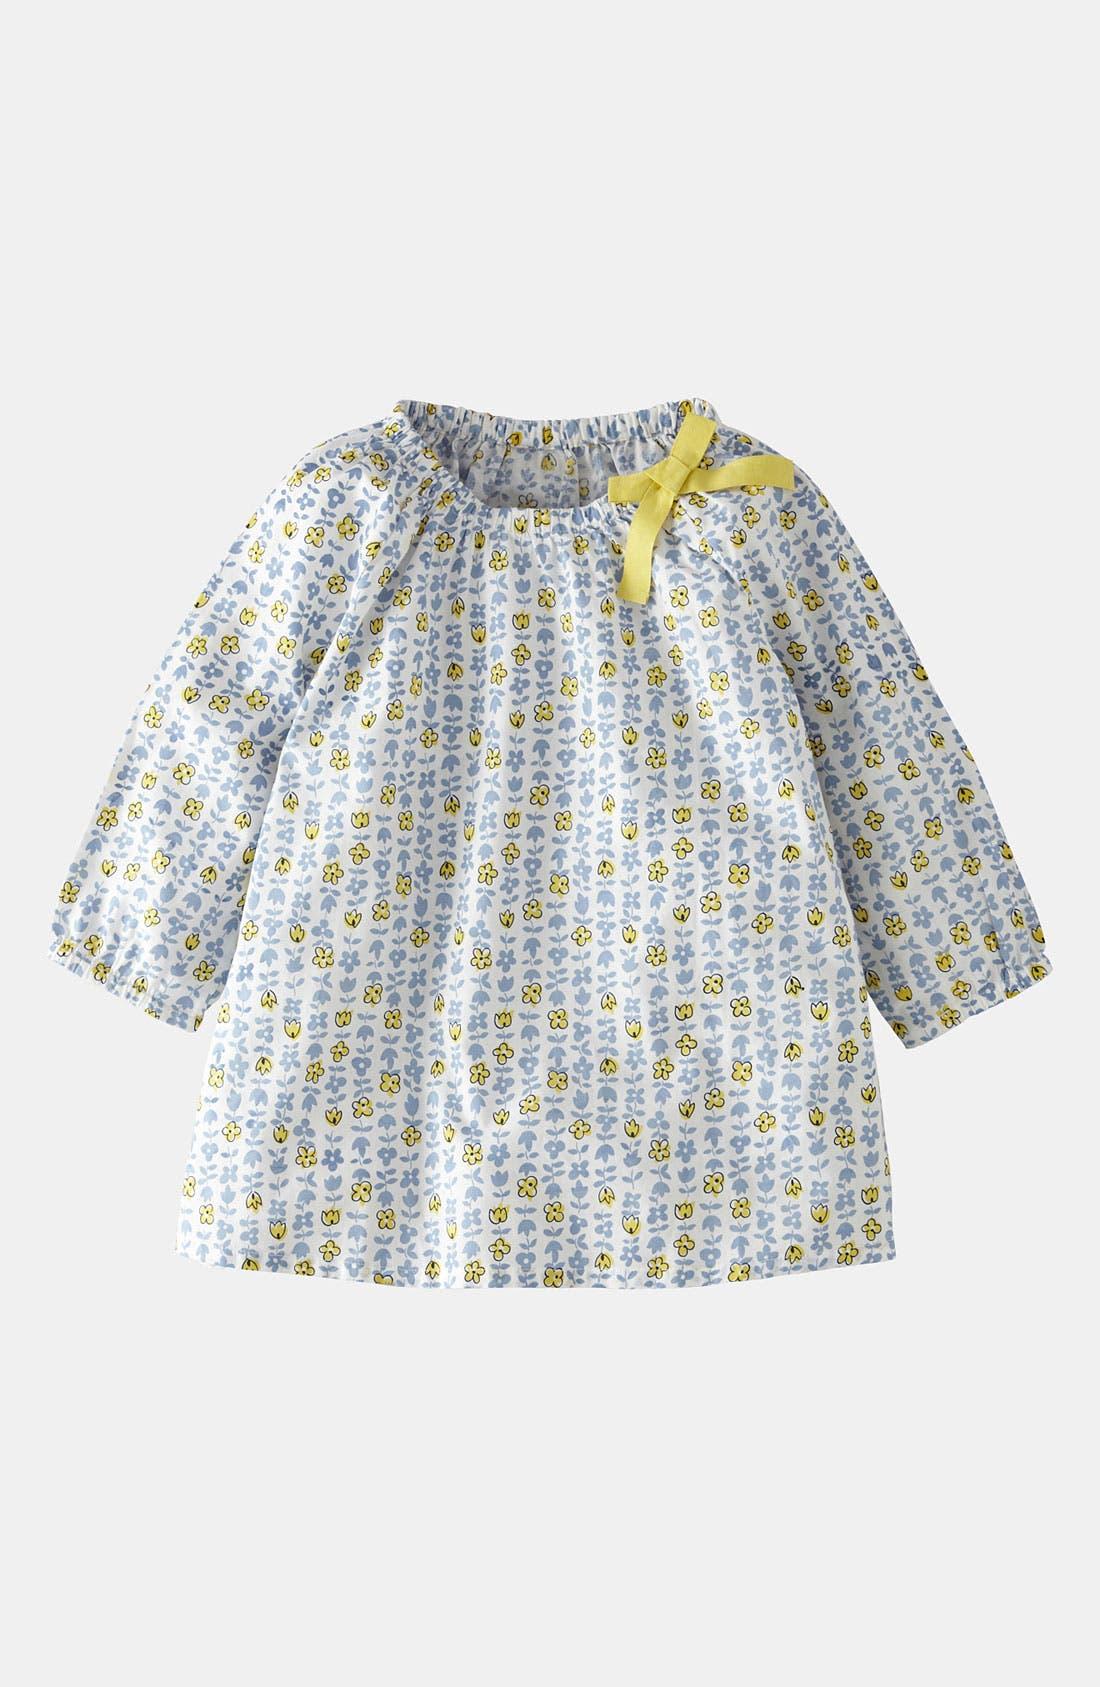 Alternate Image 1 Selected - Mini Boden 'Pretty' Woven Top (Little Girls & Big Girls)